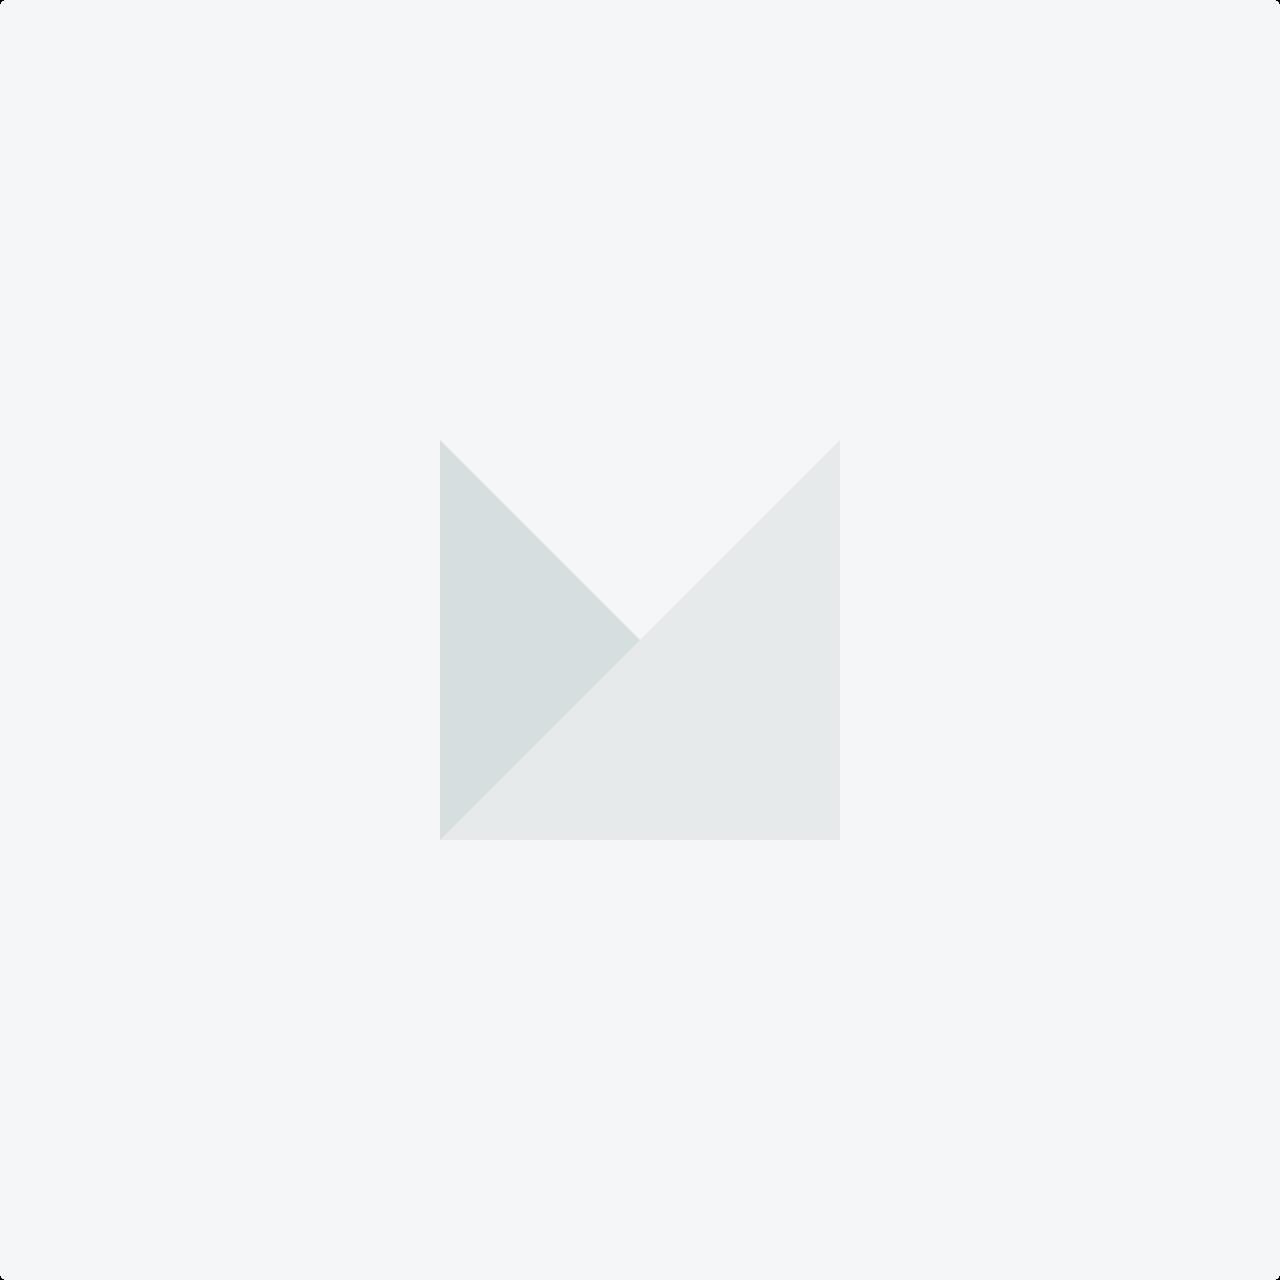 Рабочая зона р-01 мики рмк (орех аида табак/белый/900ммx1516.